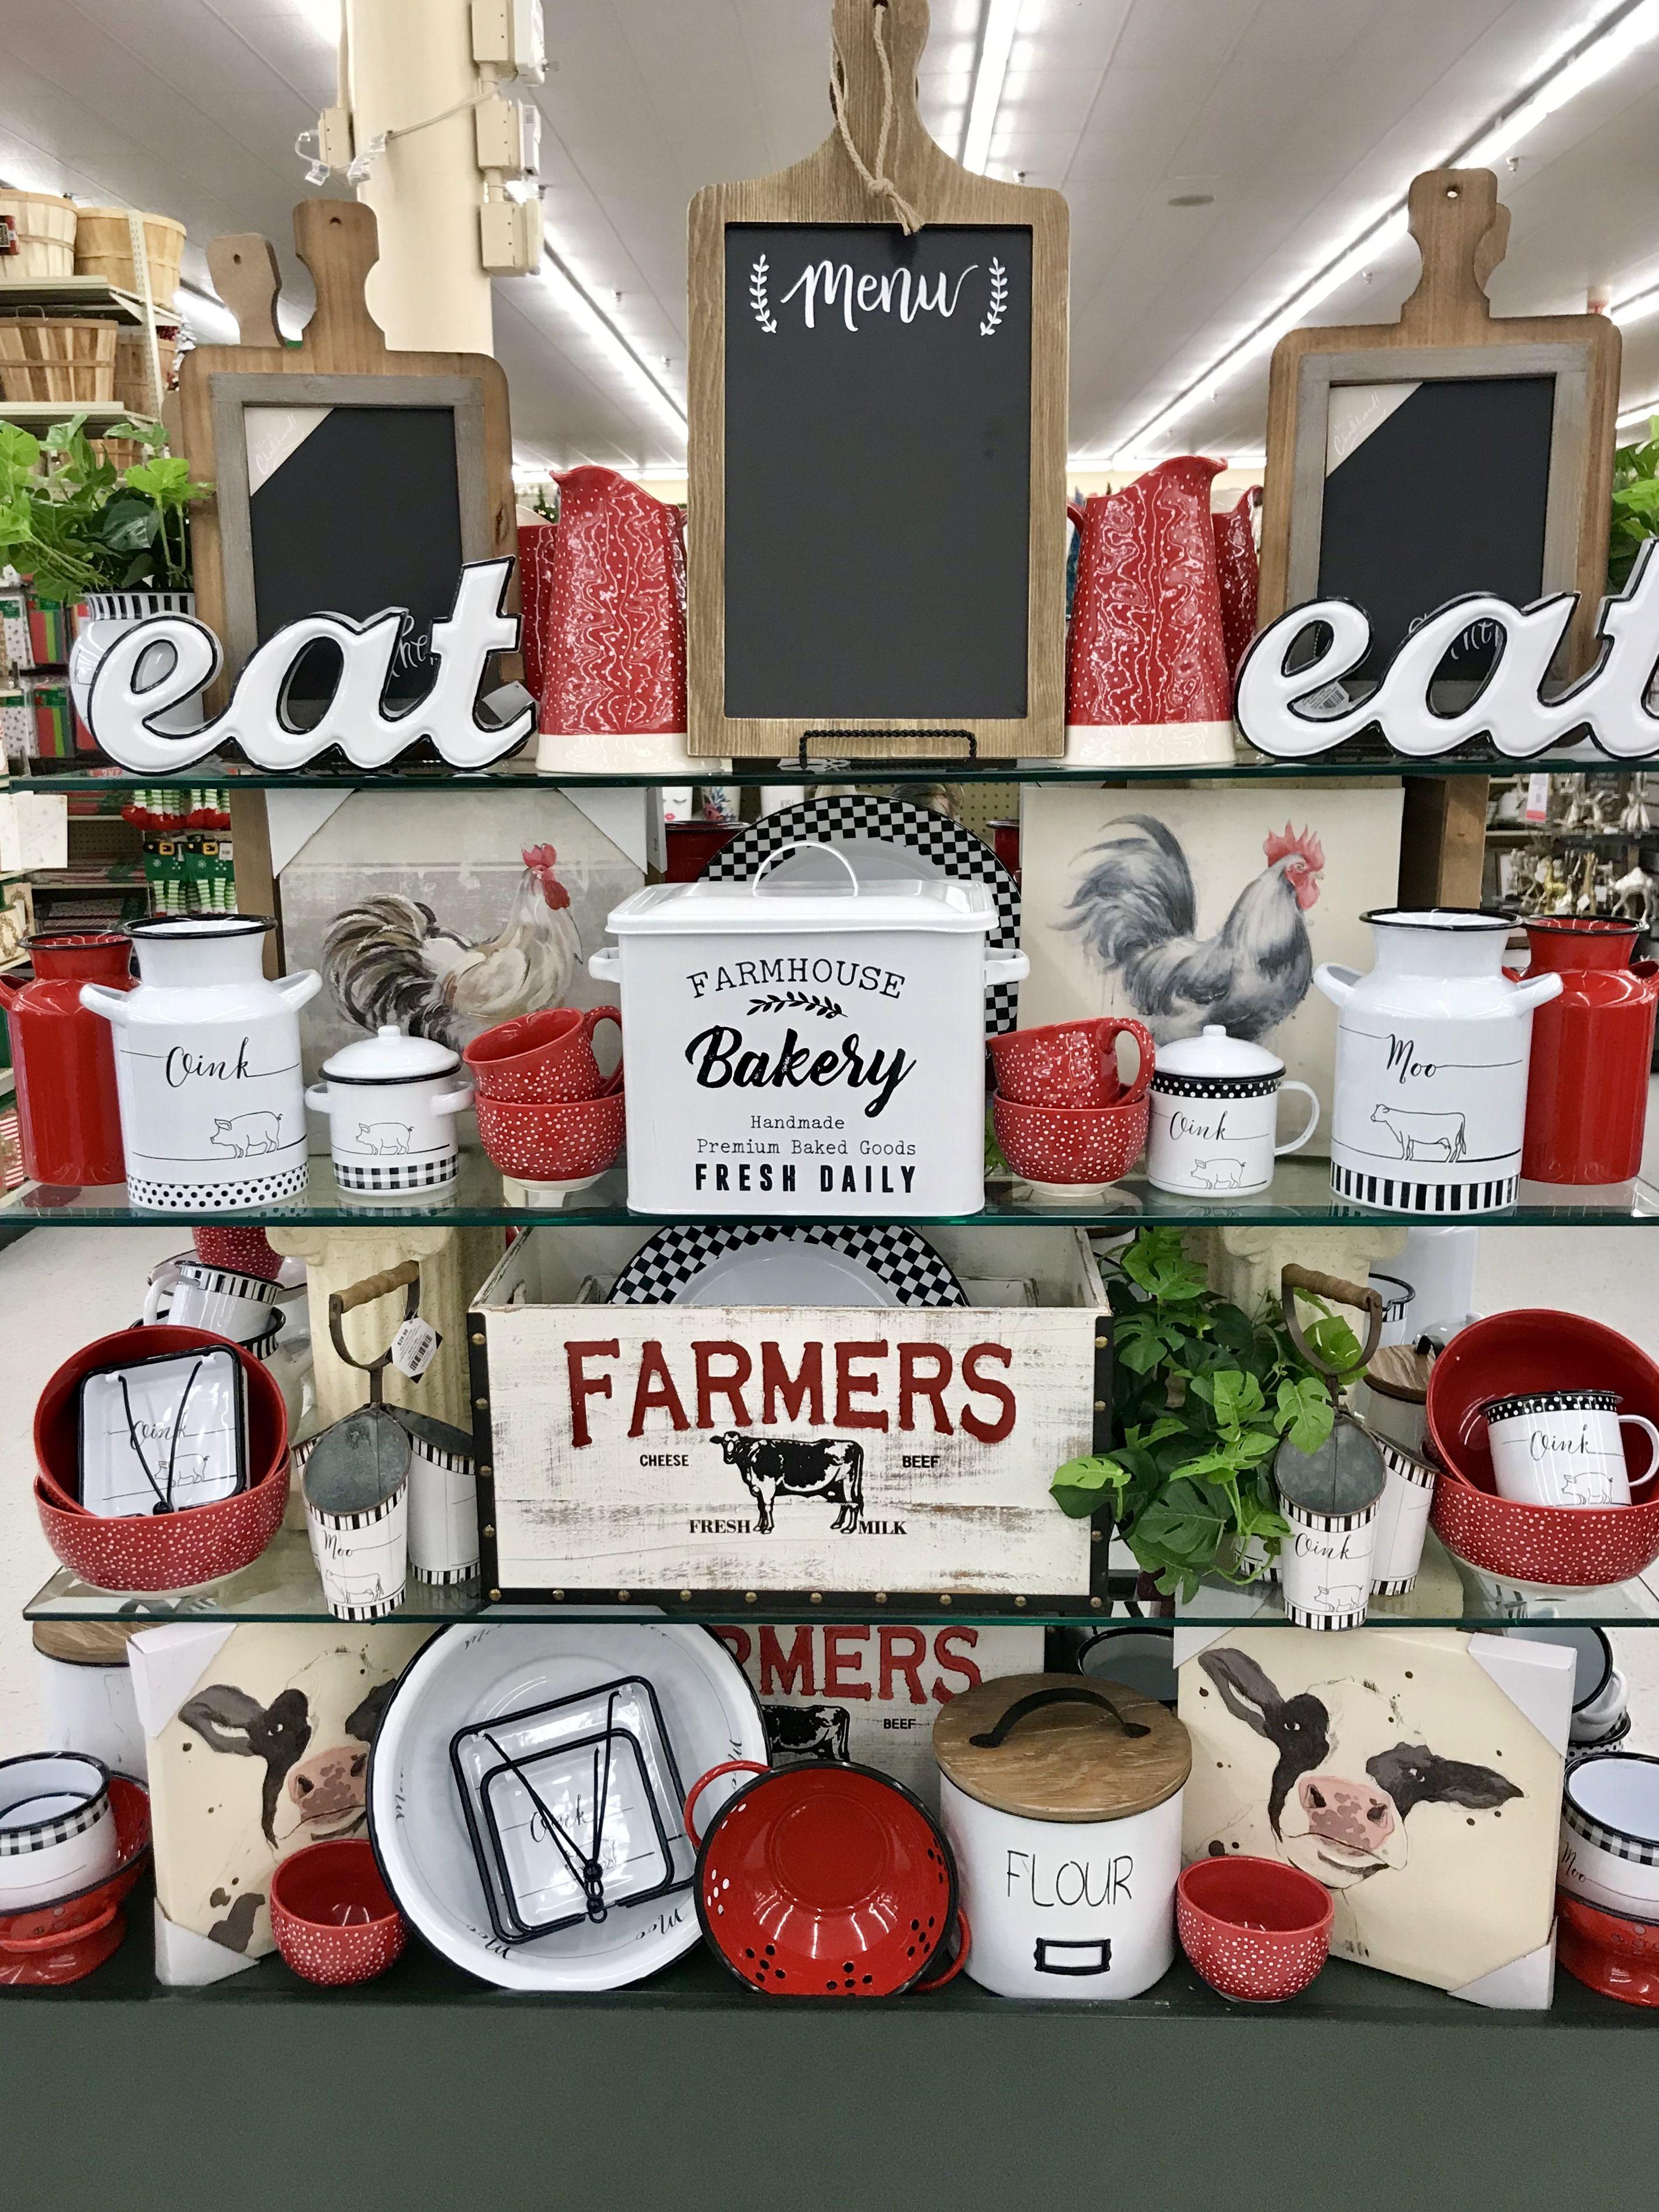 Hobby lobby merchandising table displays work Hobby